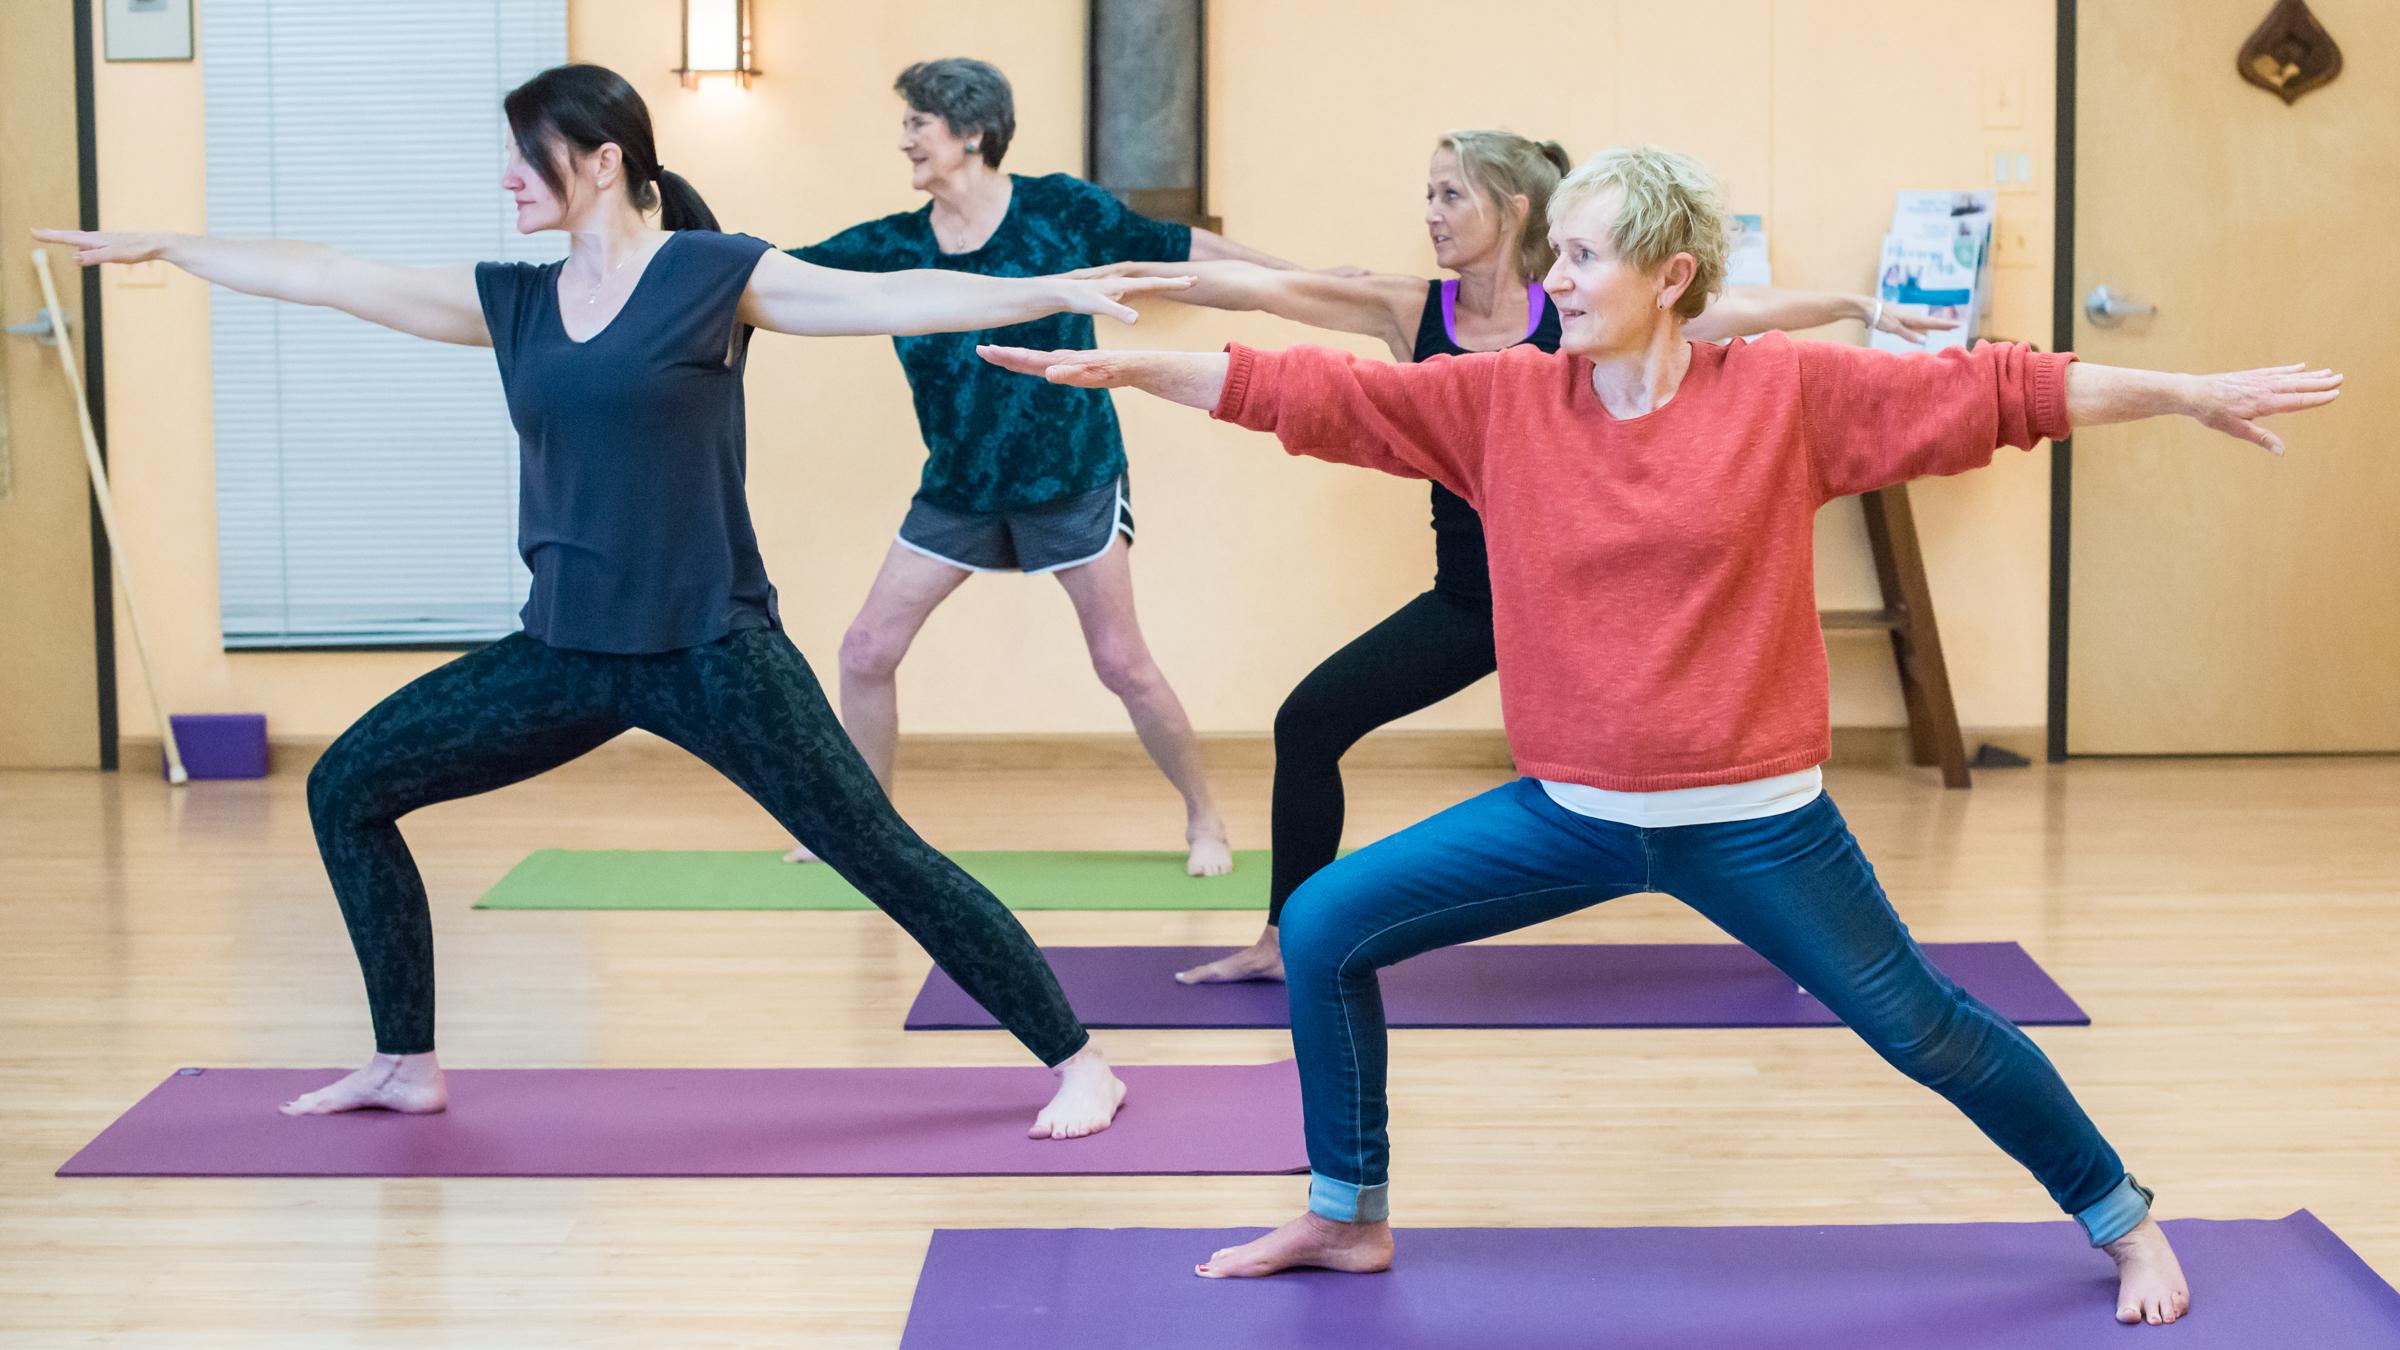 SHPT_yoga_2_v2.jpg